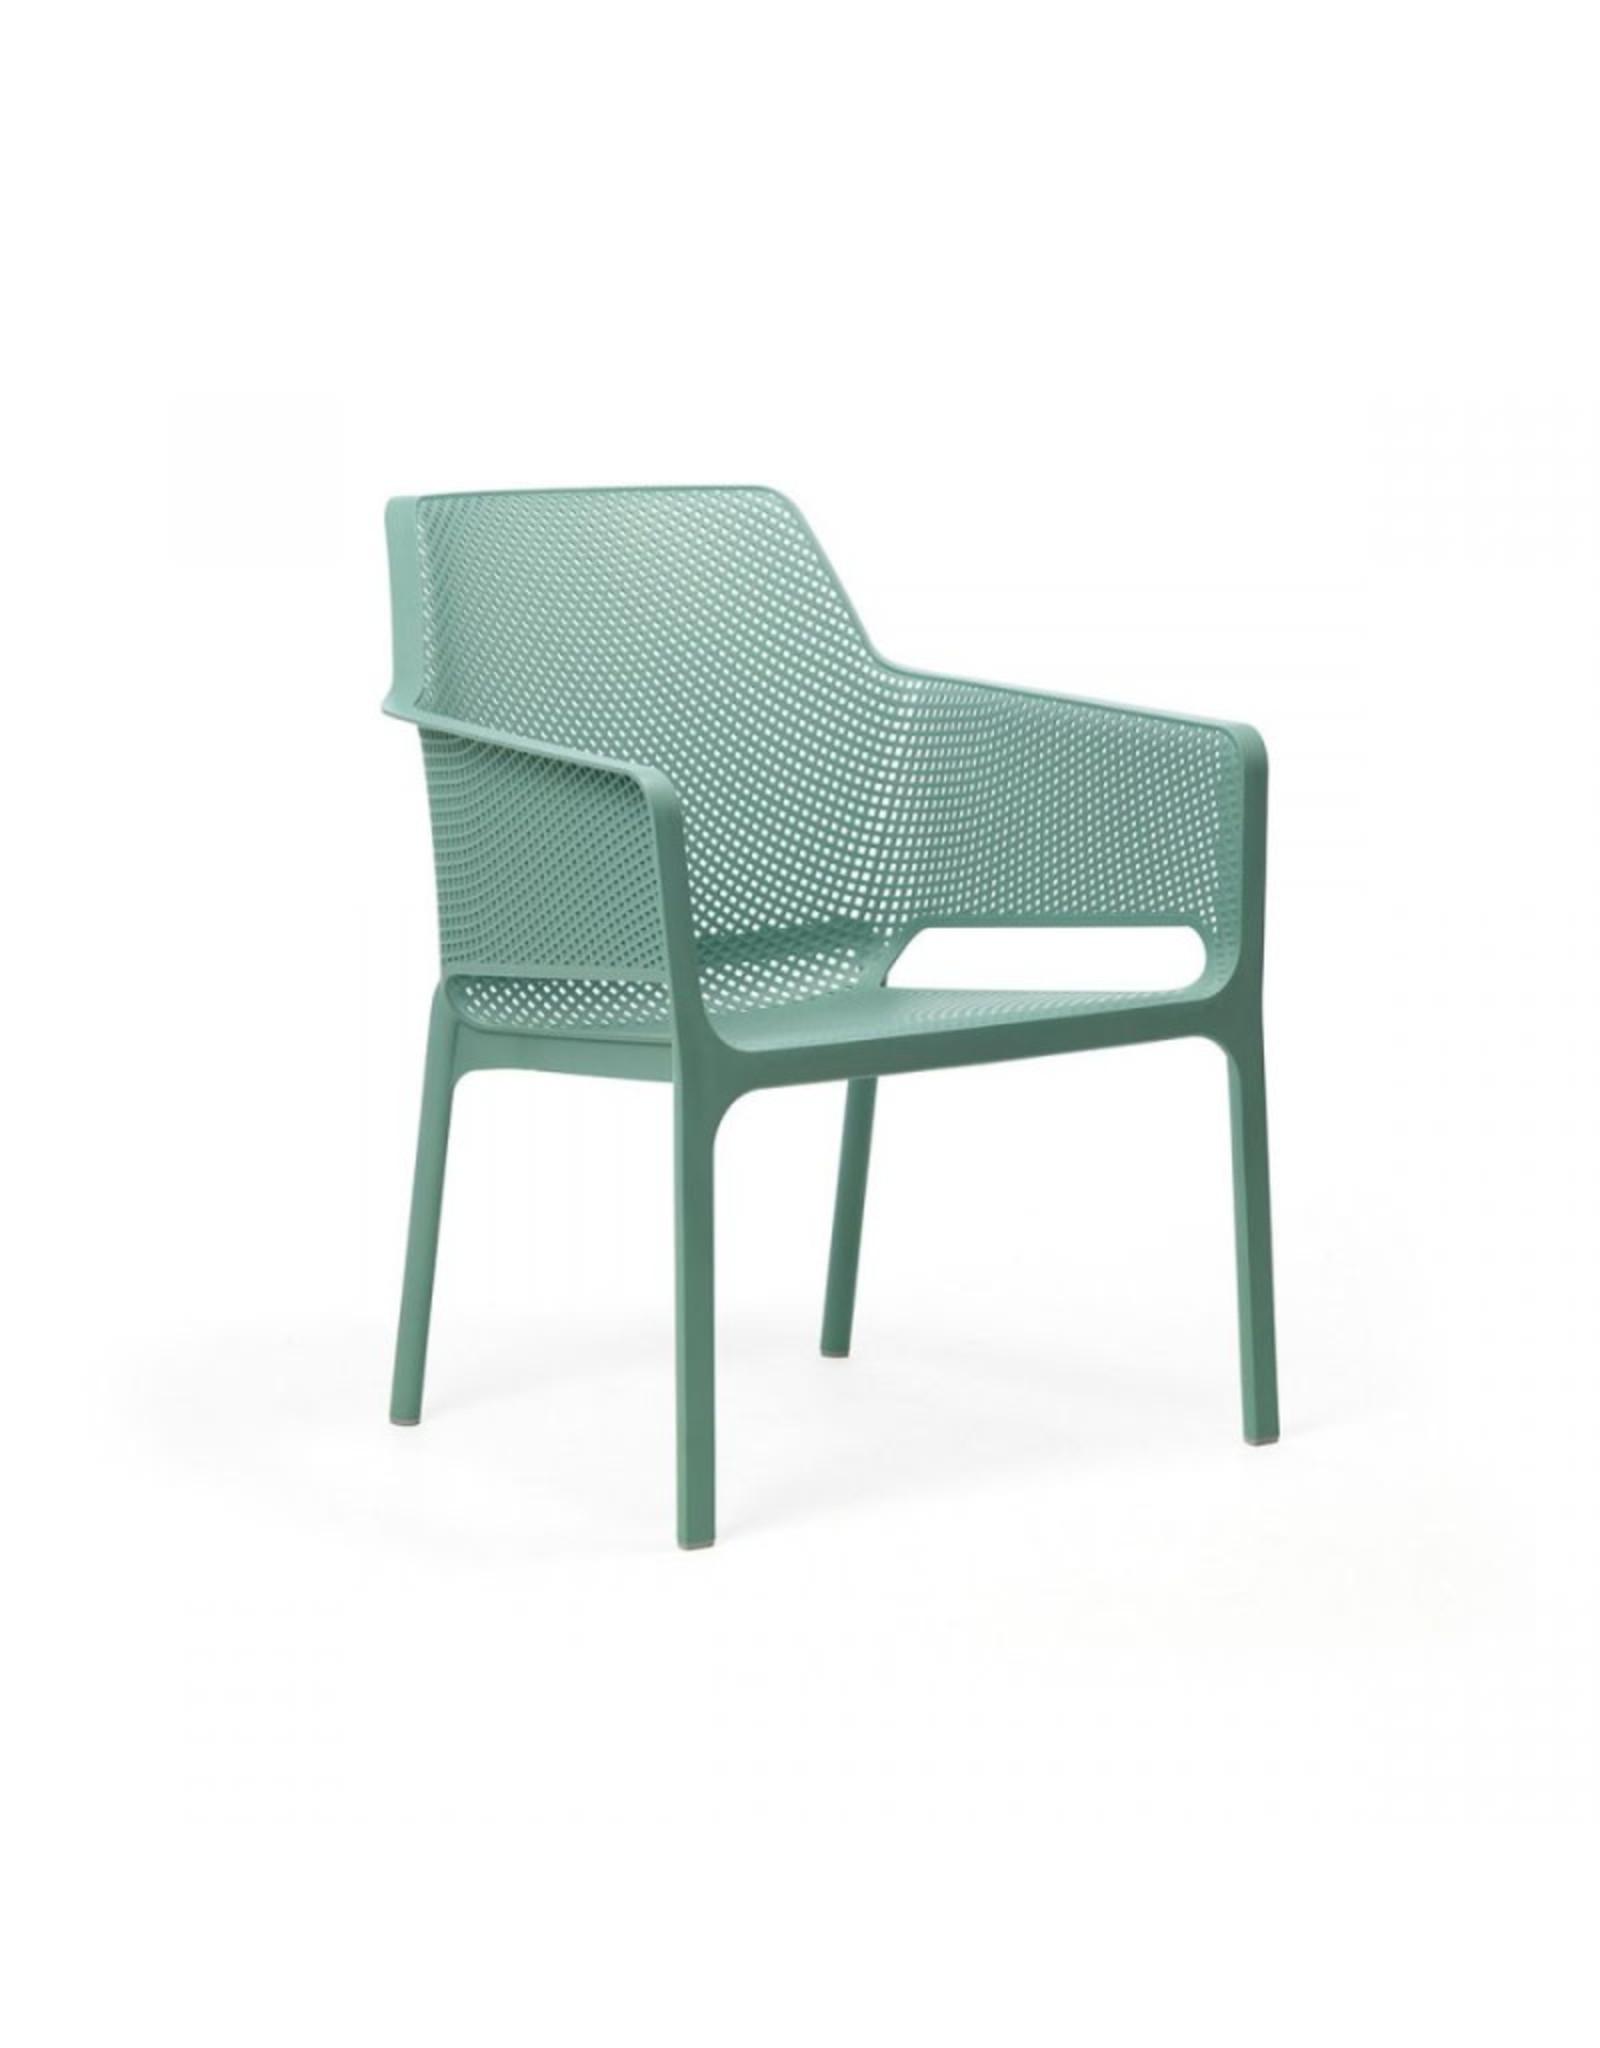 Nardi Nardi Net Relax Lounge chair